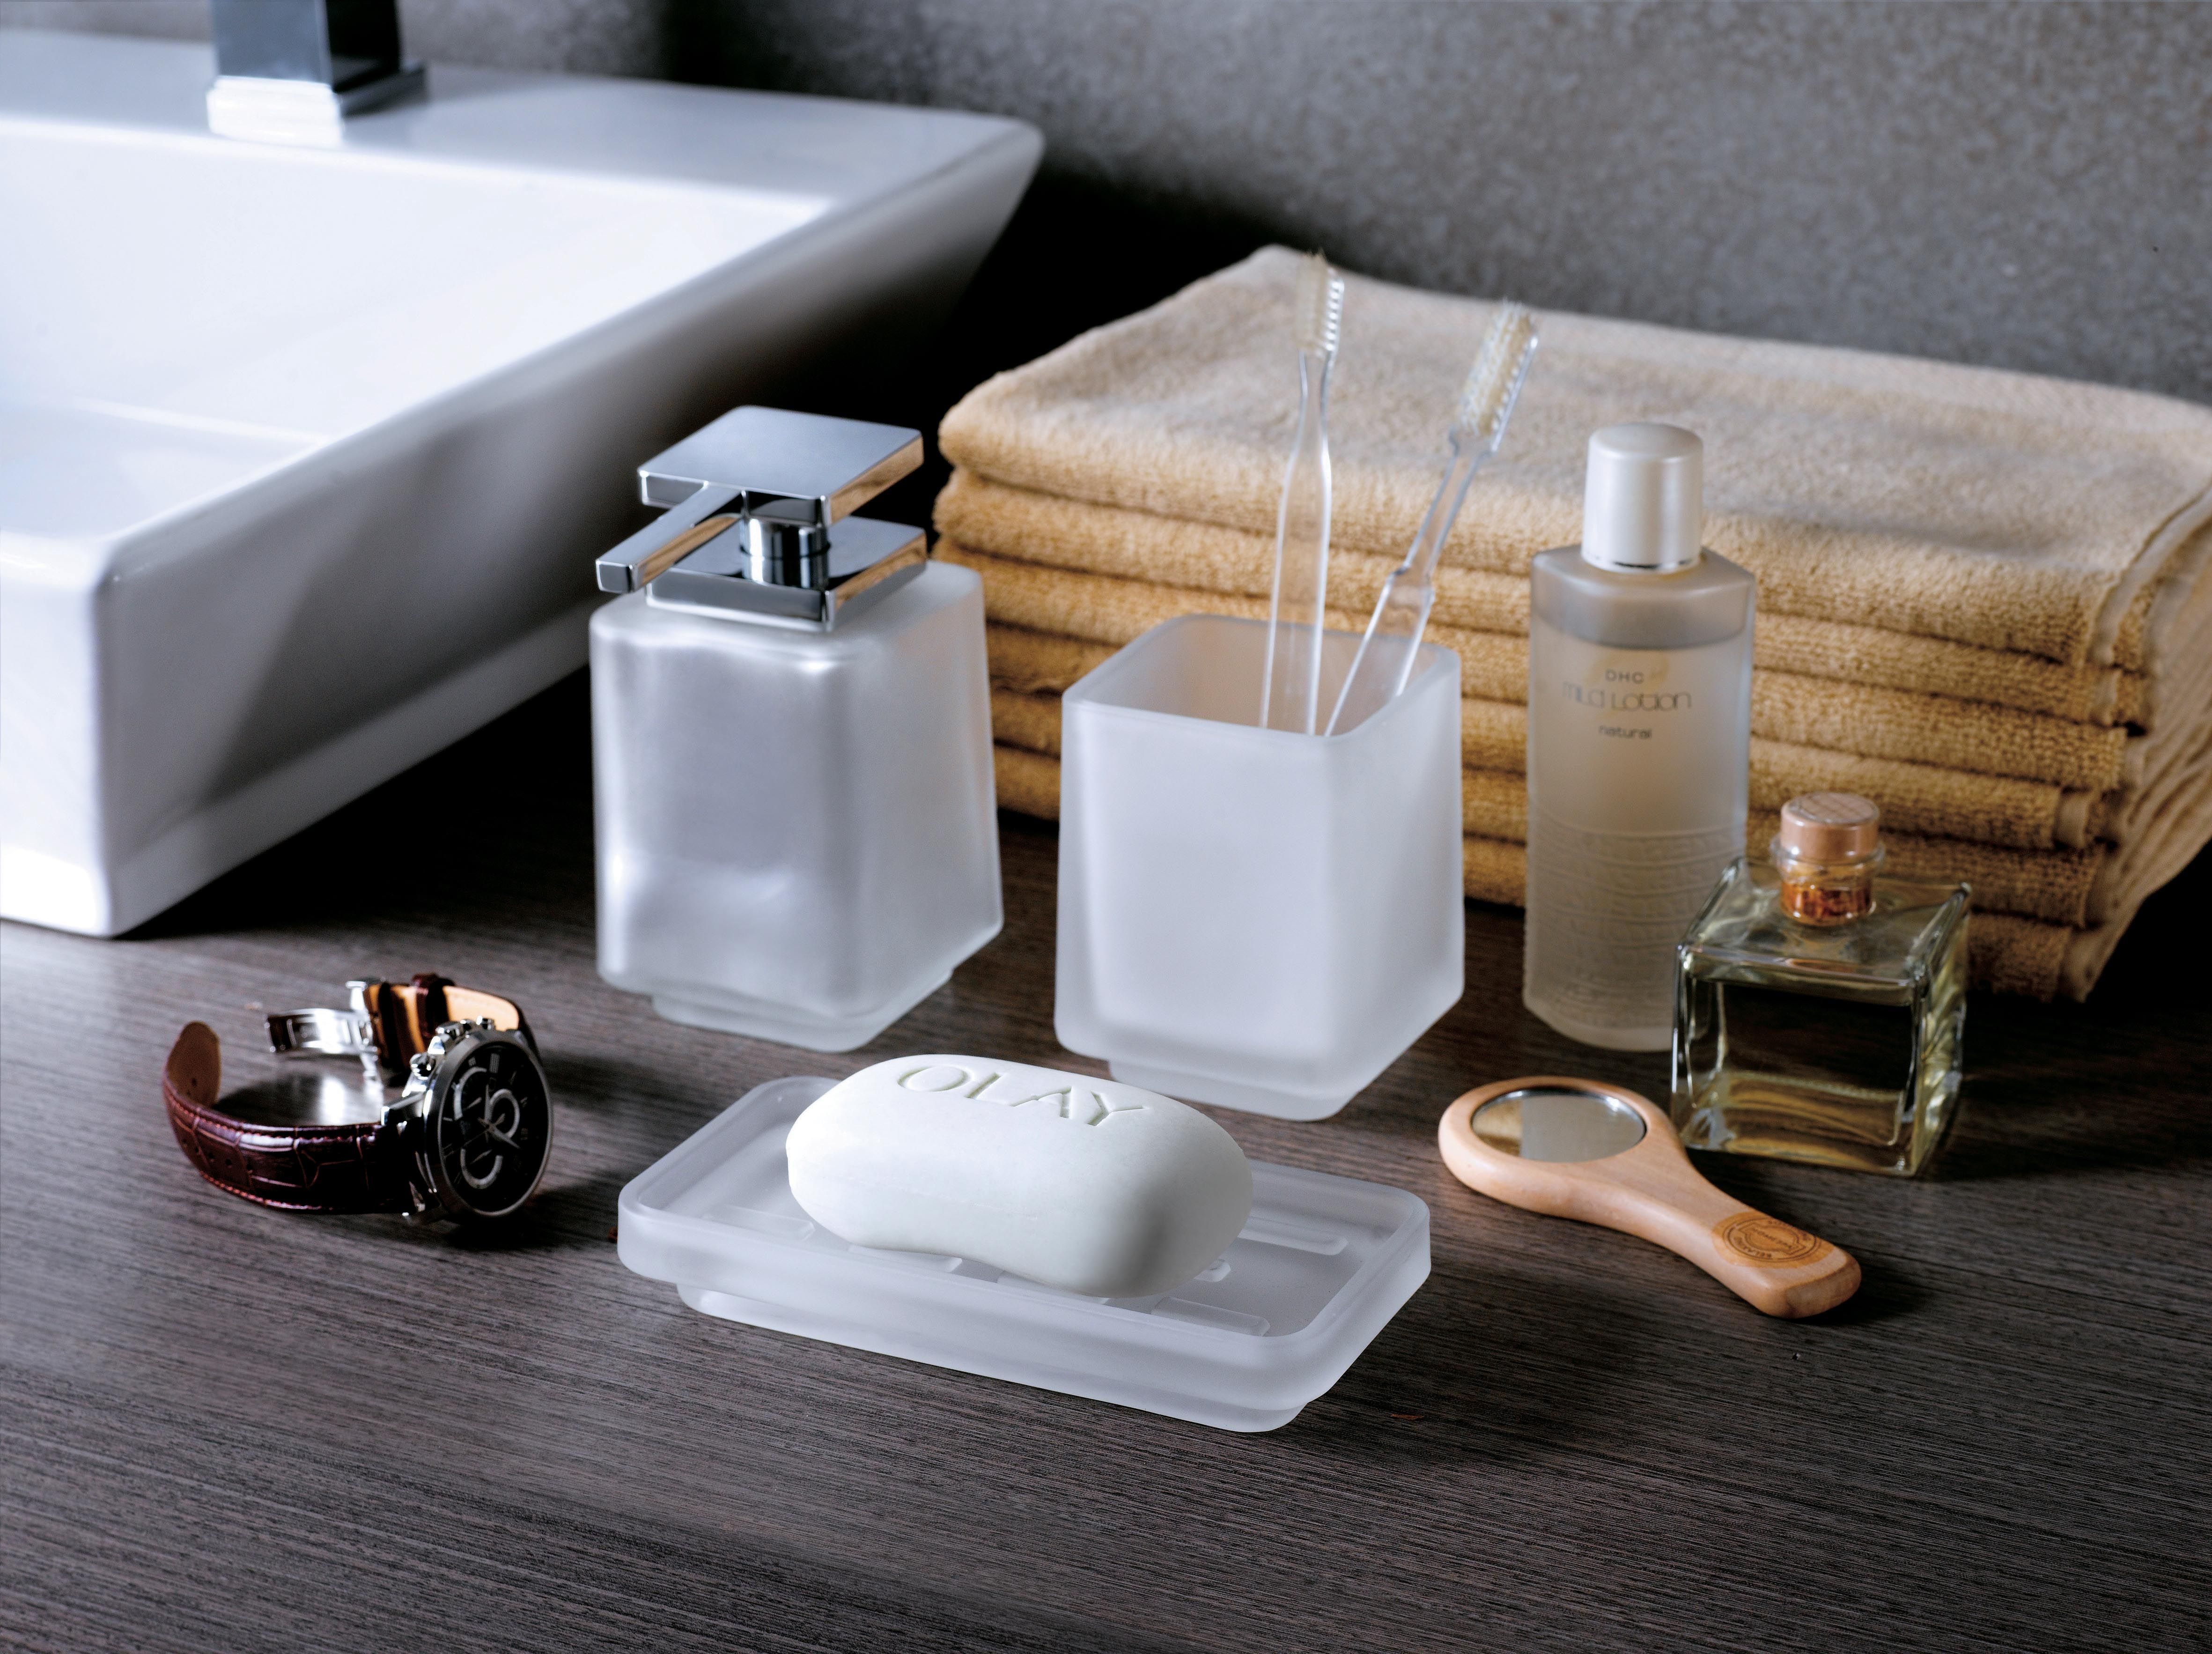 Tabletop Bathroom Accessory / Dezi Home